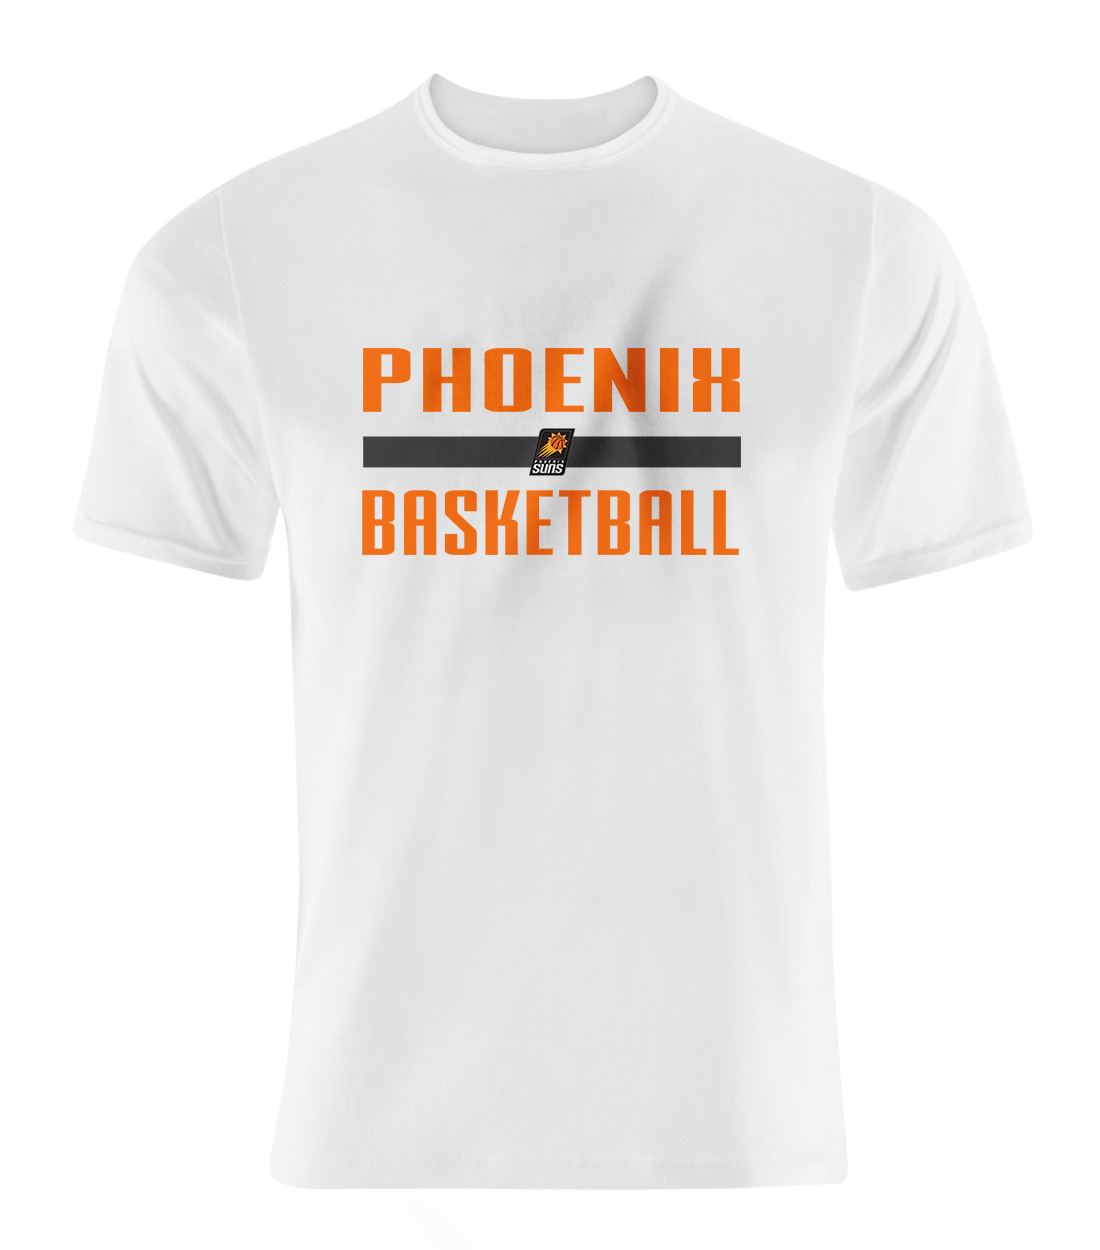 Phoneix Suns Basketball Tshirt (TSH-WHT-SKR-Phoneix-bsktball-535)